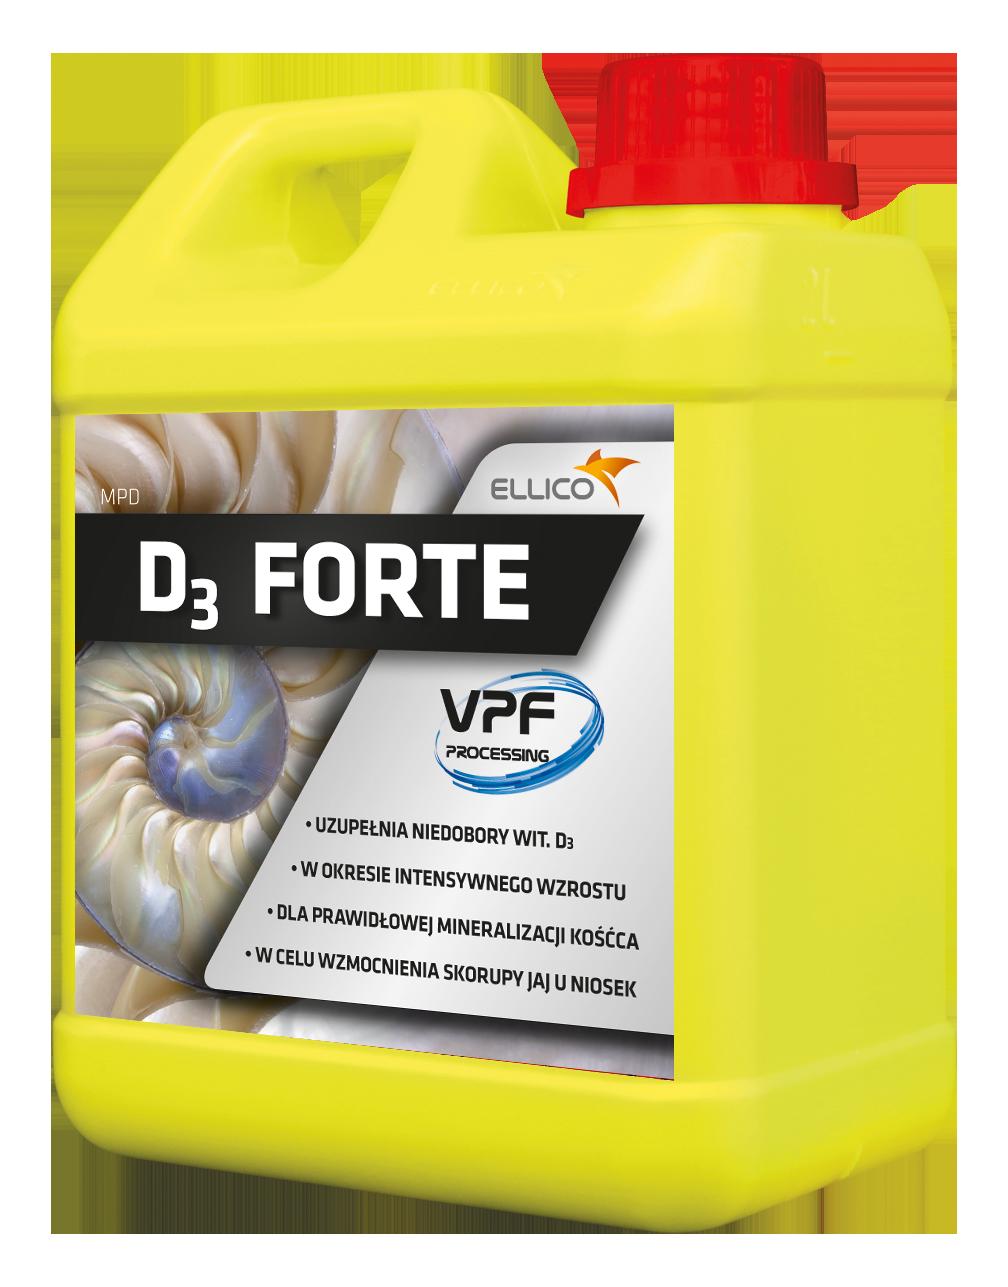 D3 FORTE